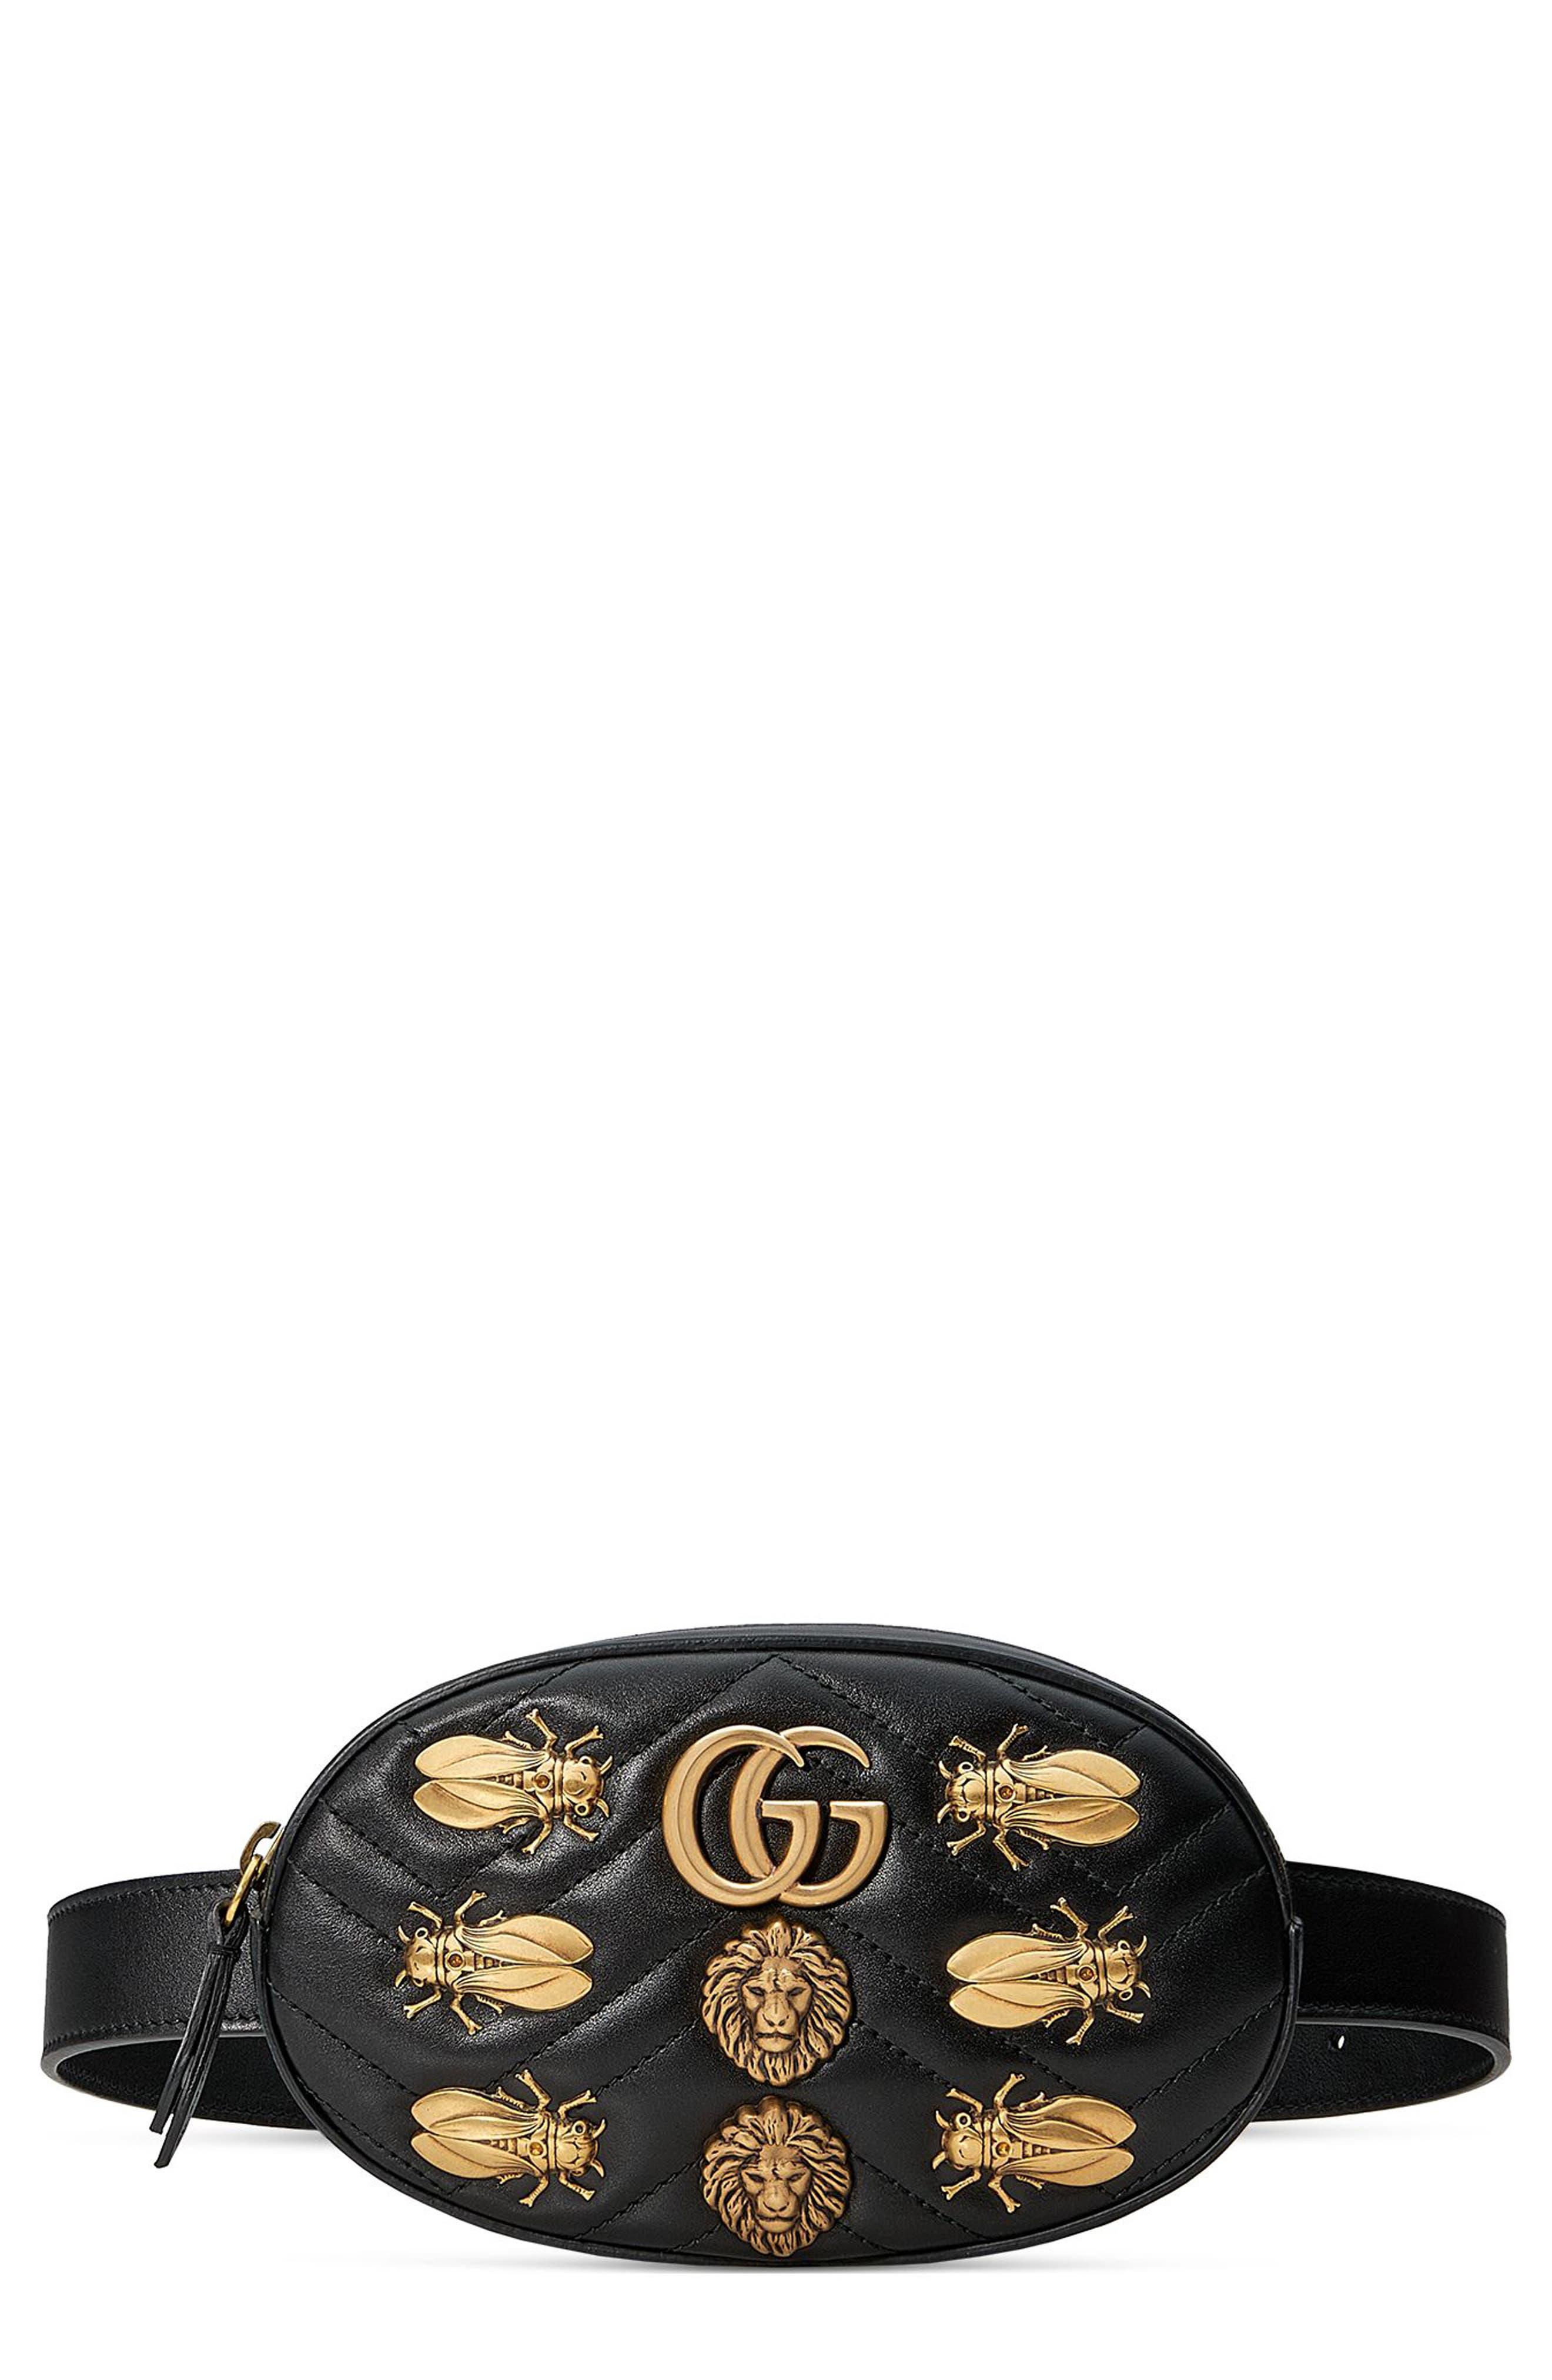 Gucci GG Marmont 2.0 Animal Stud Matelassé Leather Belt Bag